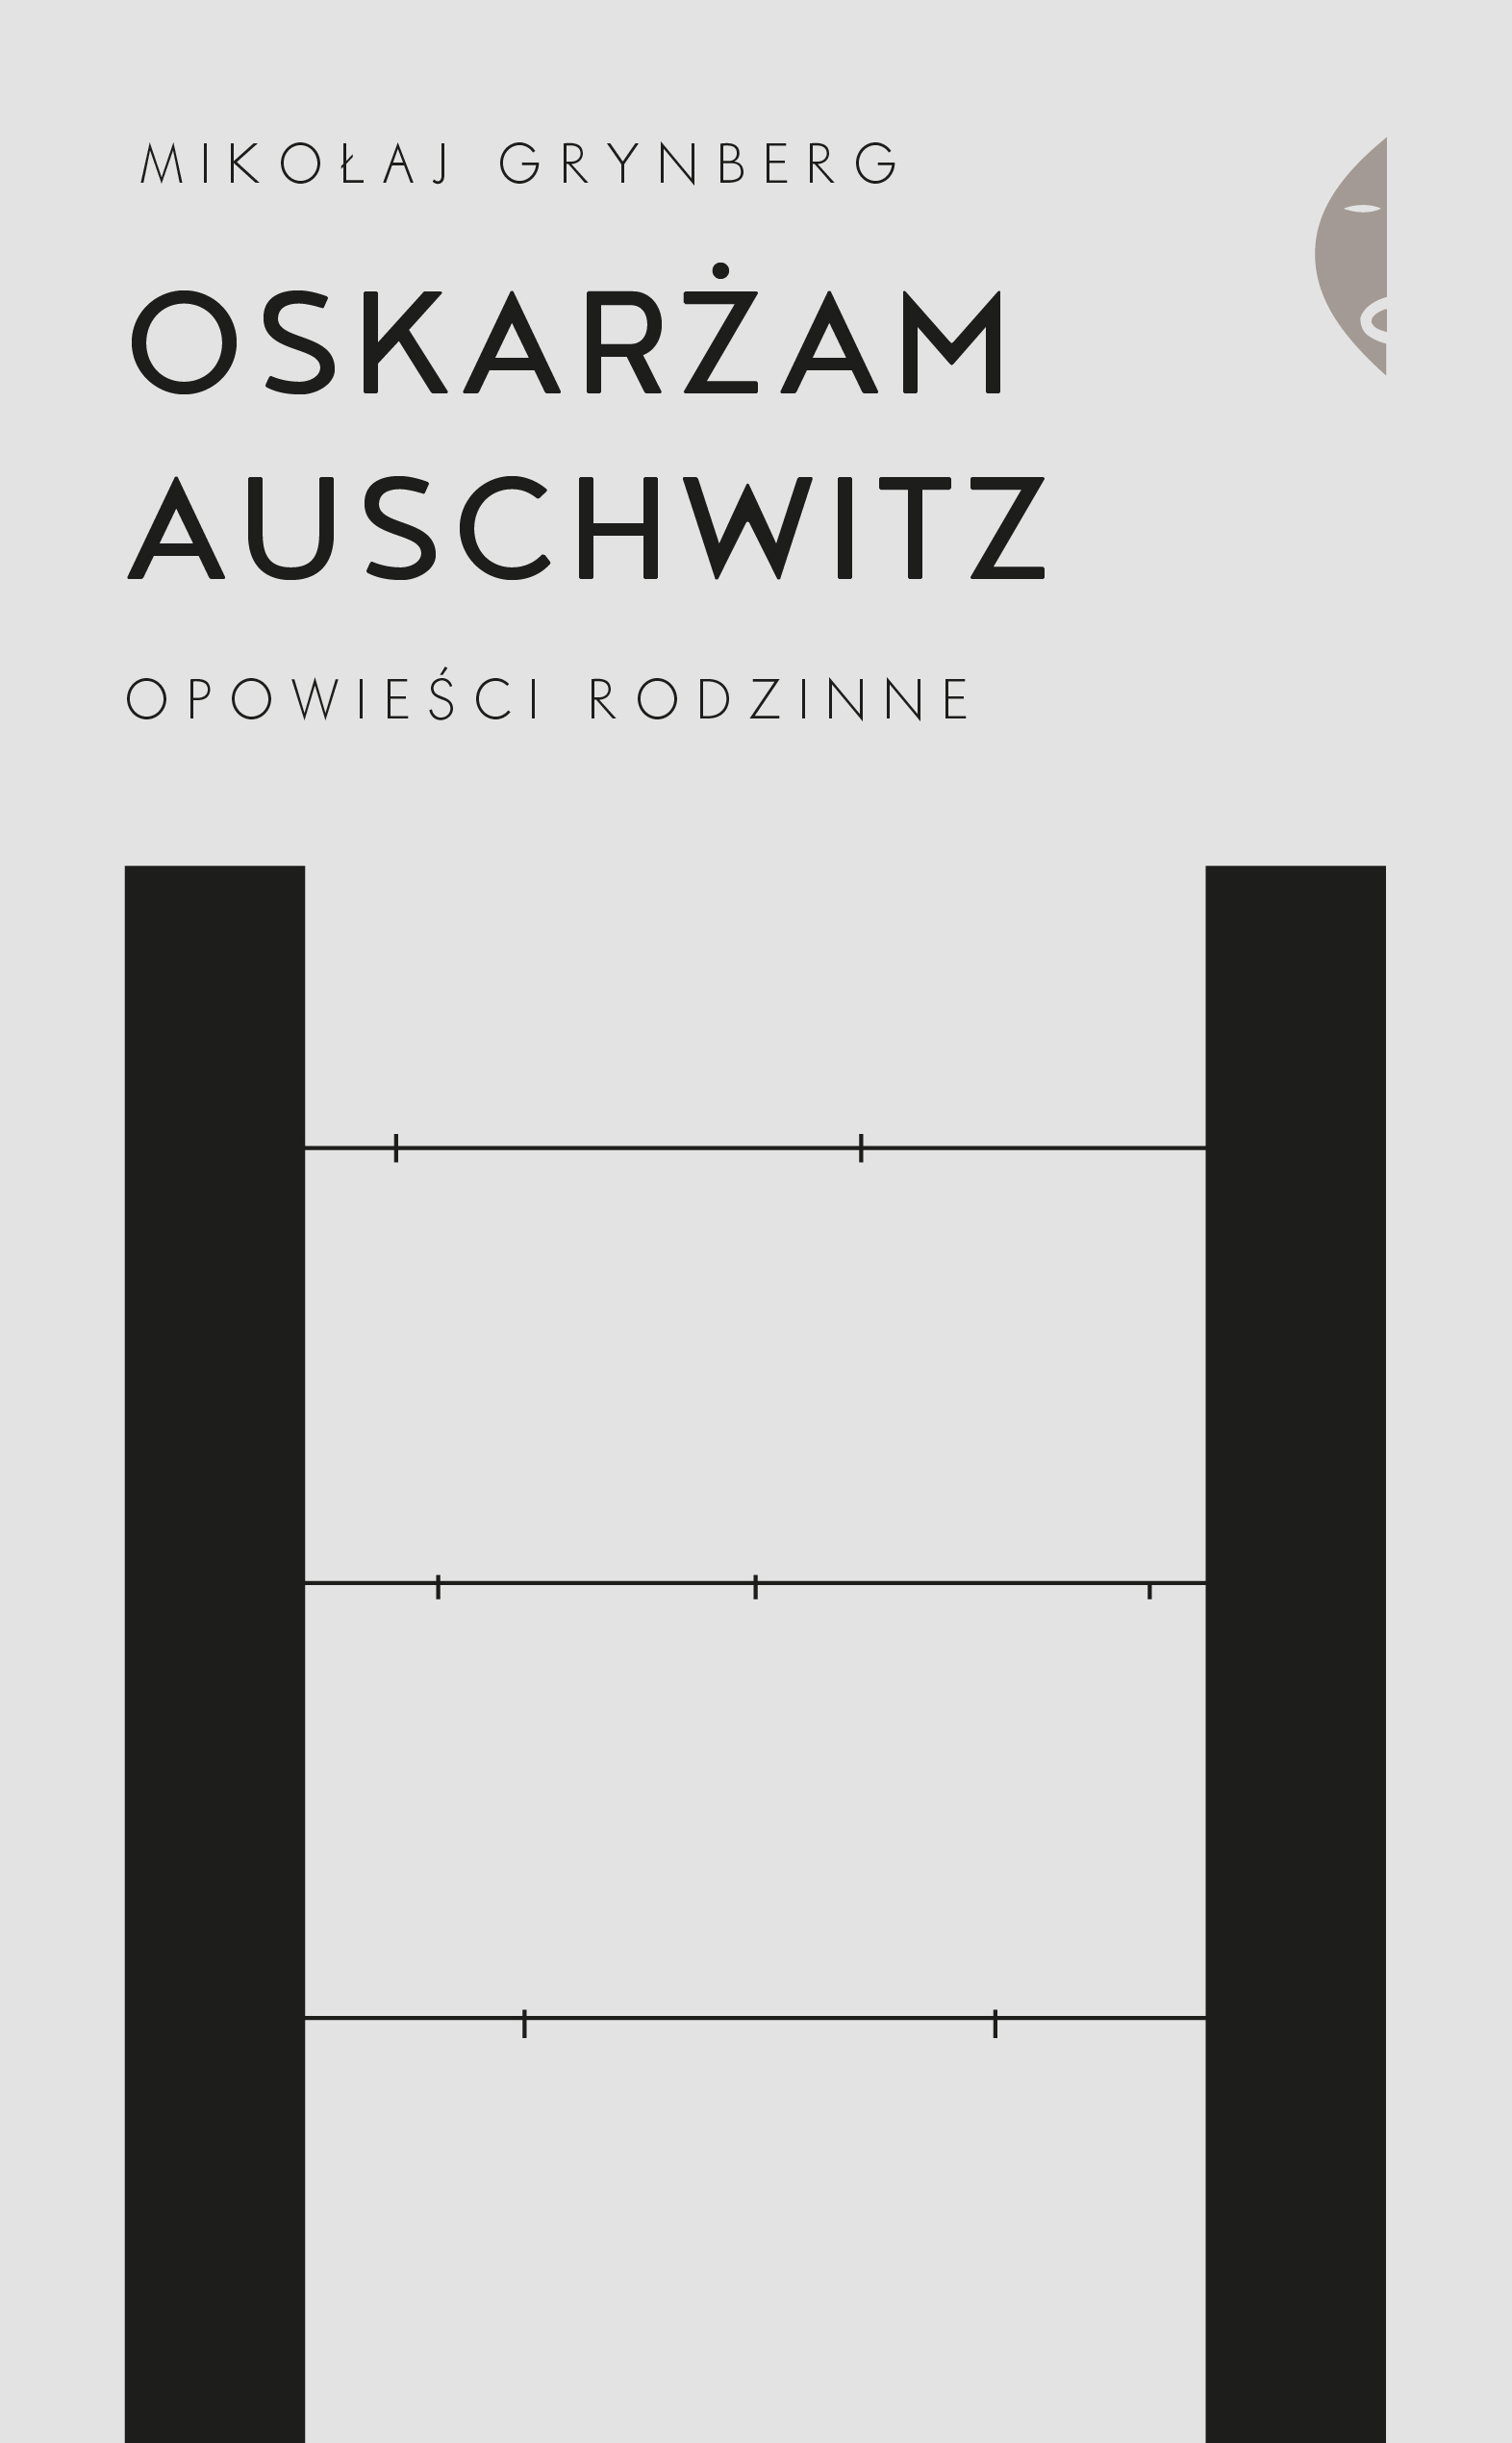 grynberg_oskarz_am_auschwitz_300_RGB